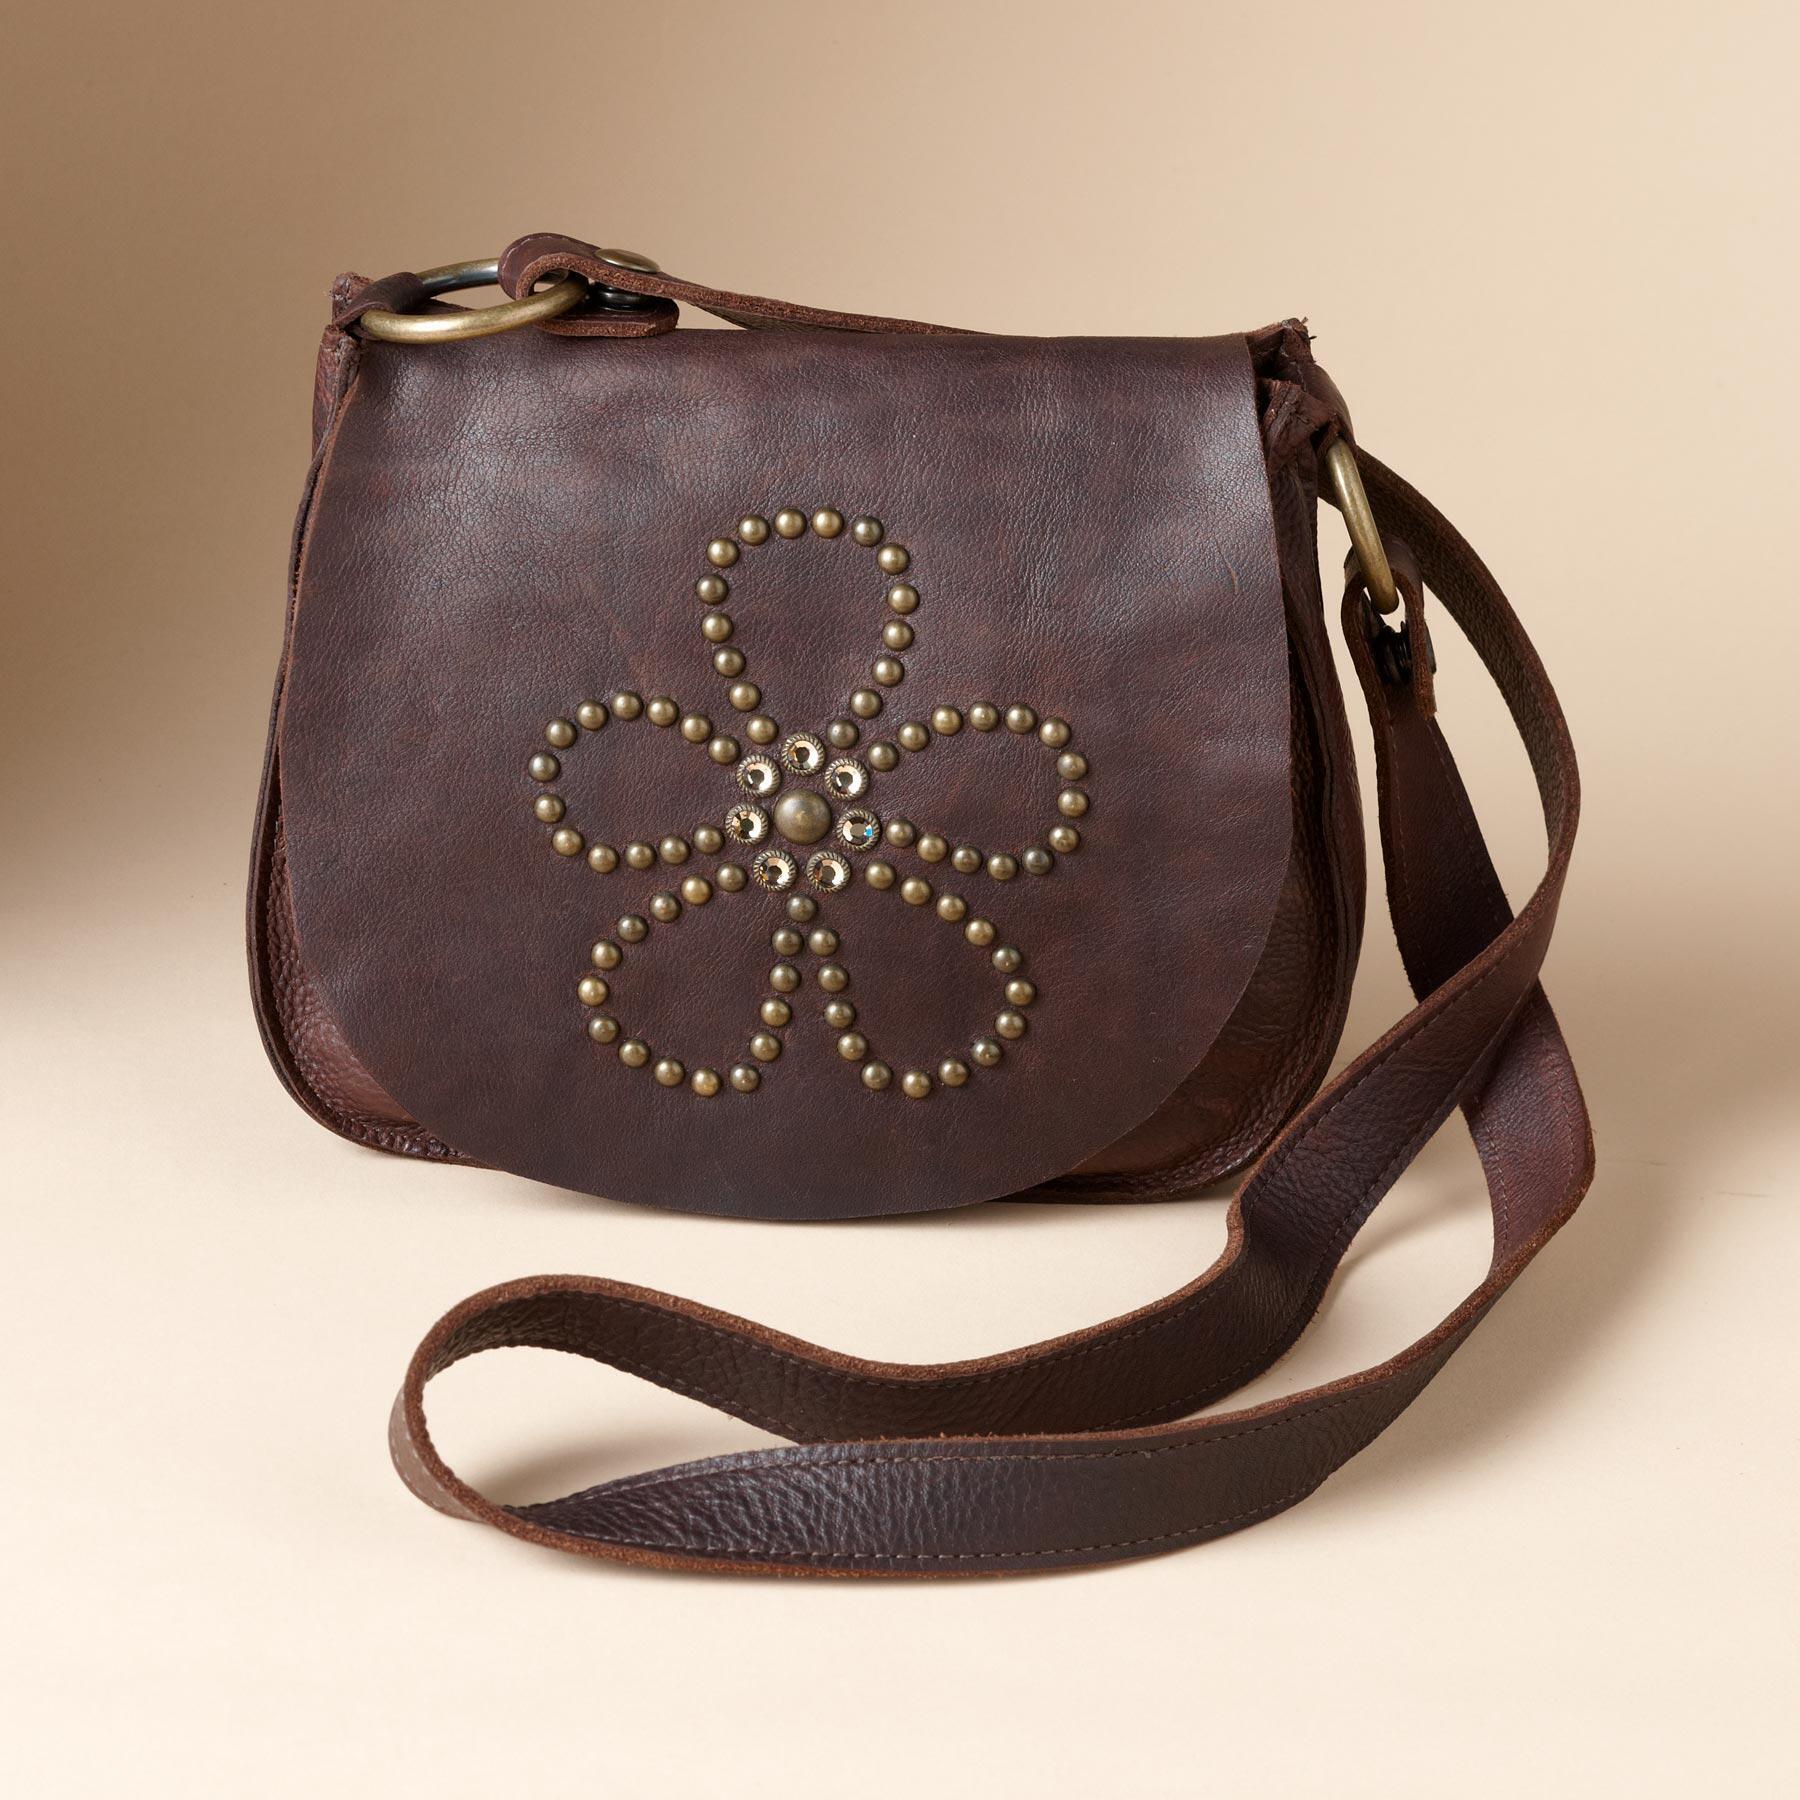 FLOWER-STUDDED CROSSBODY BAG: View 1